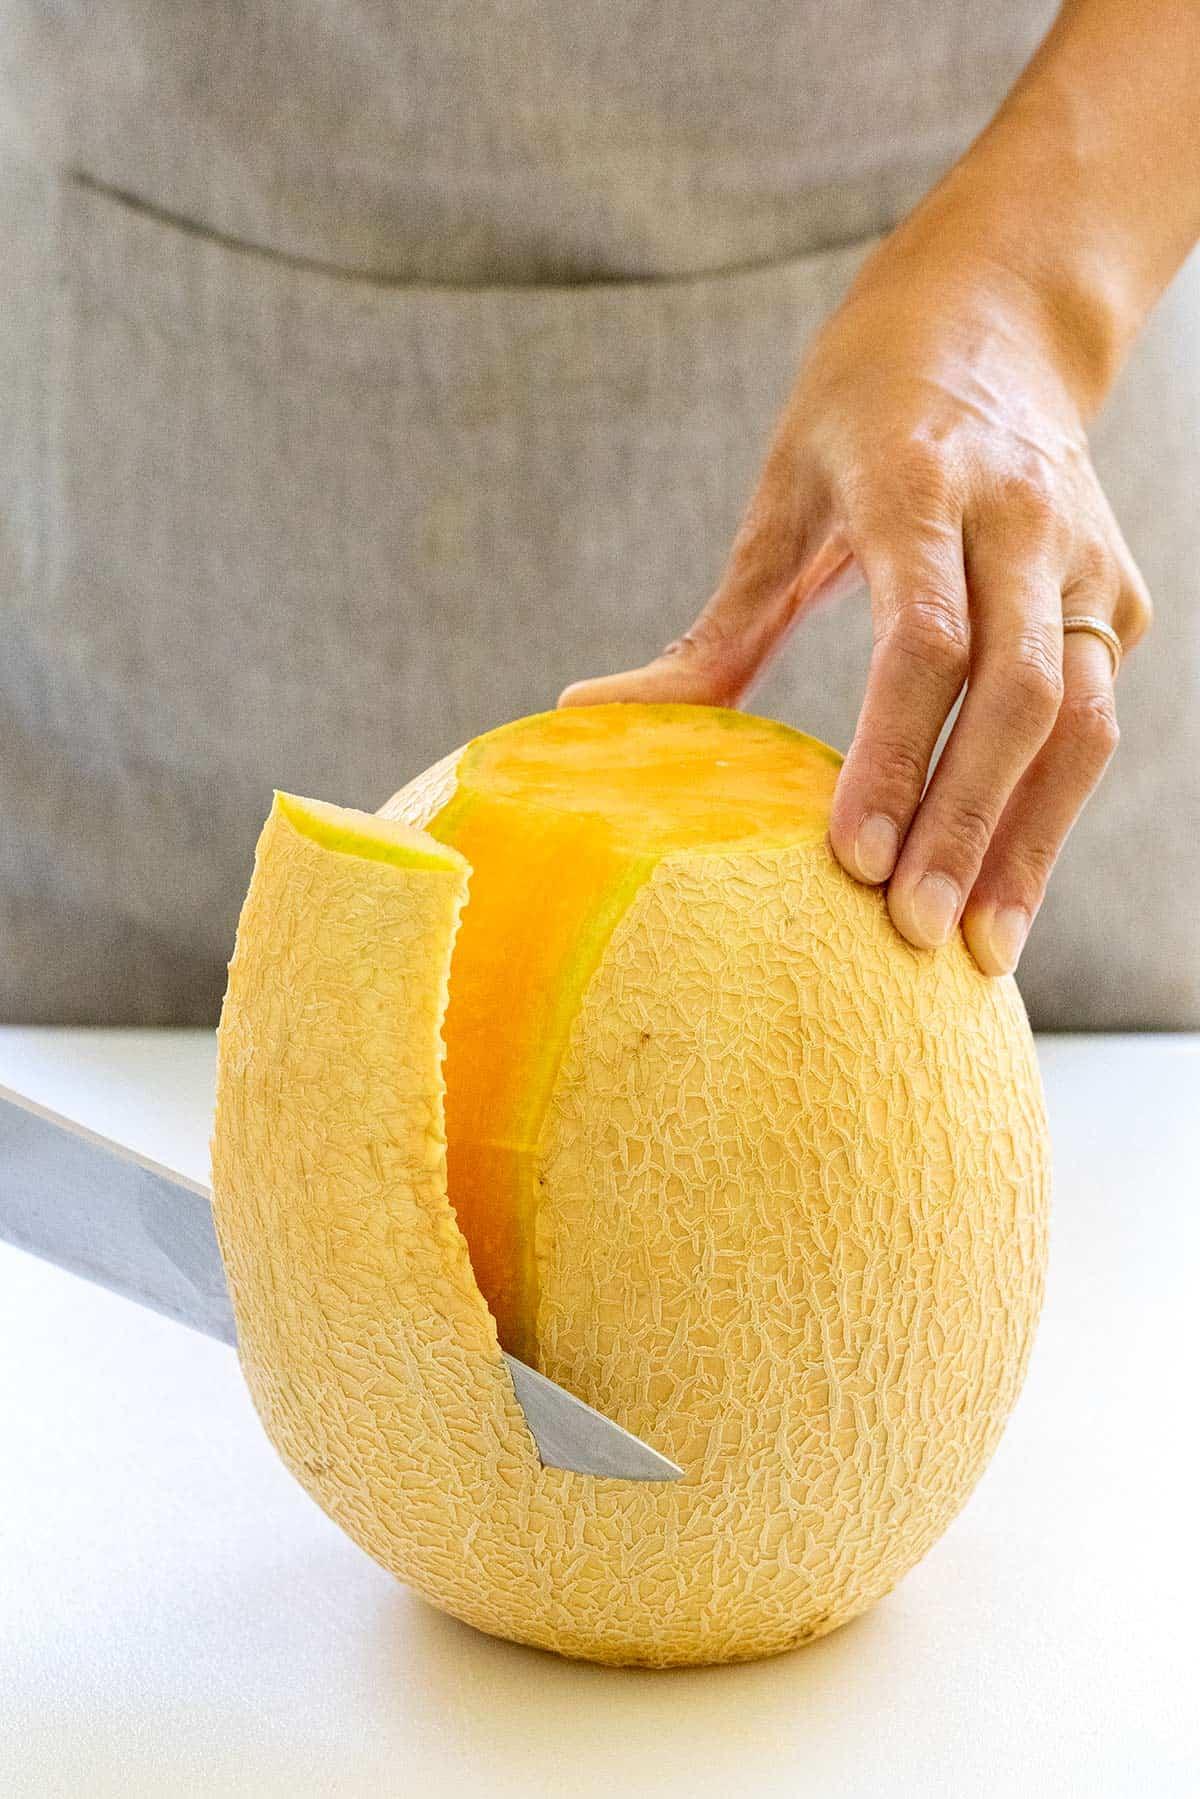 knife cutting rind off a cantaloupe